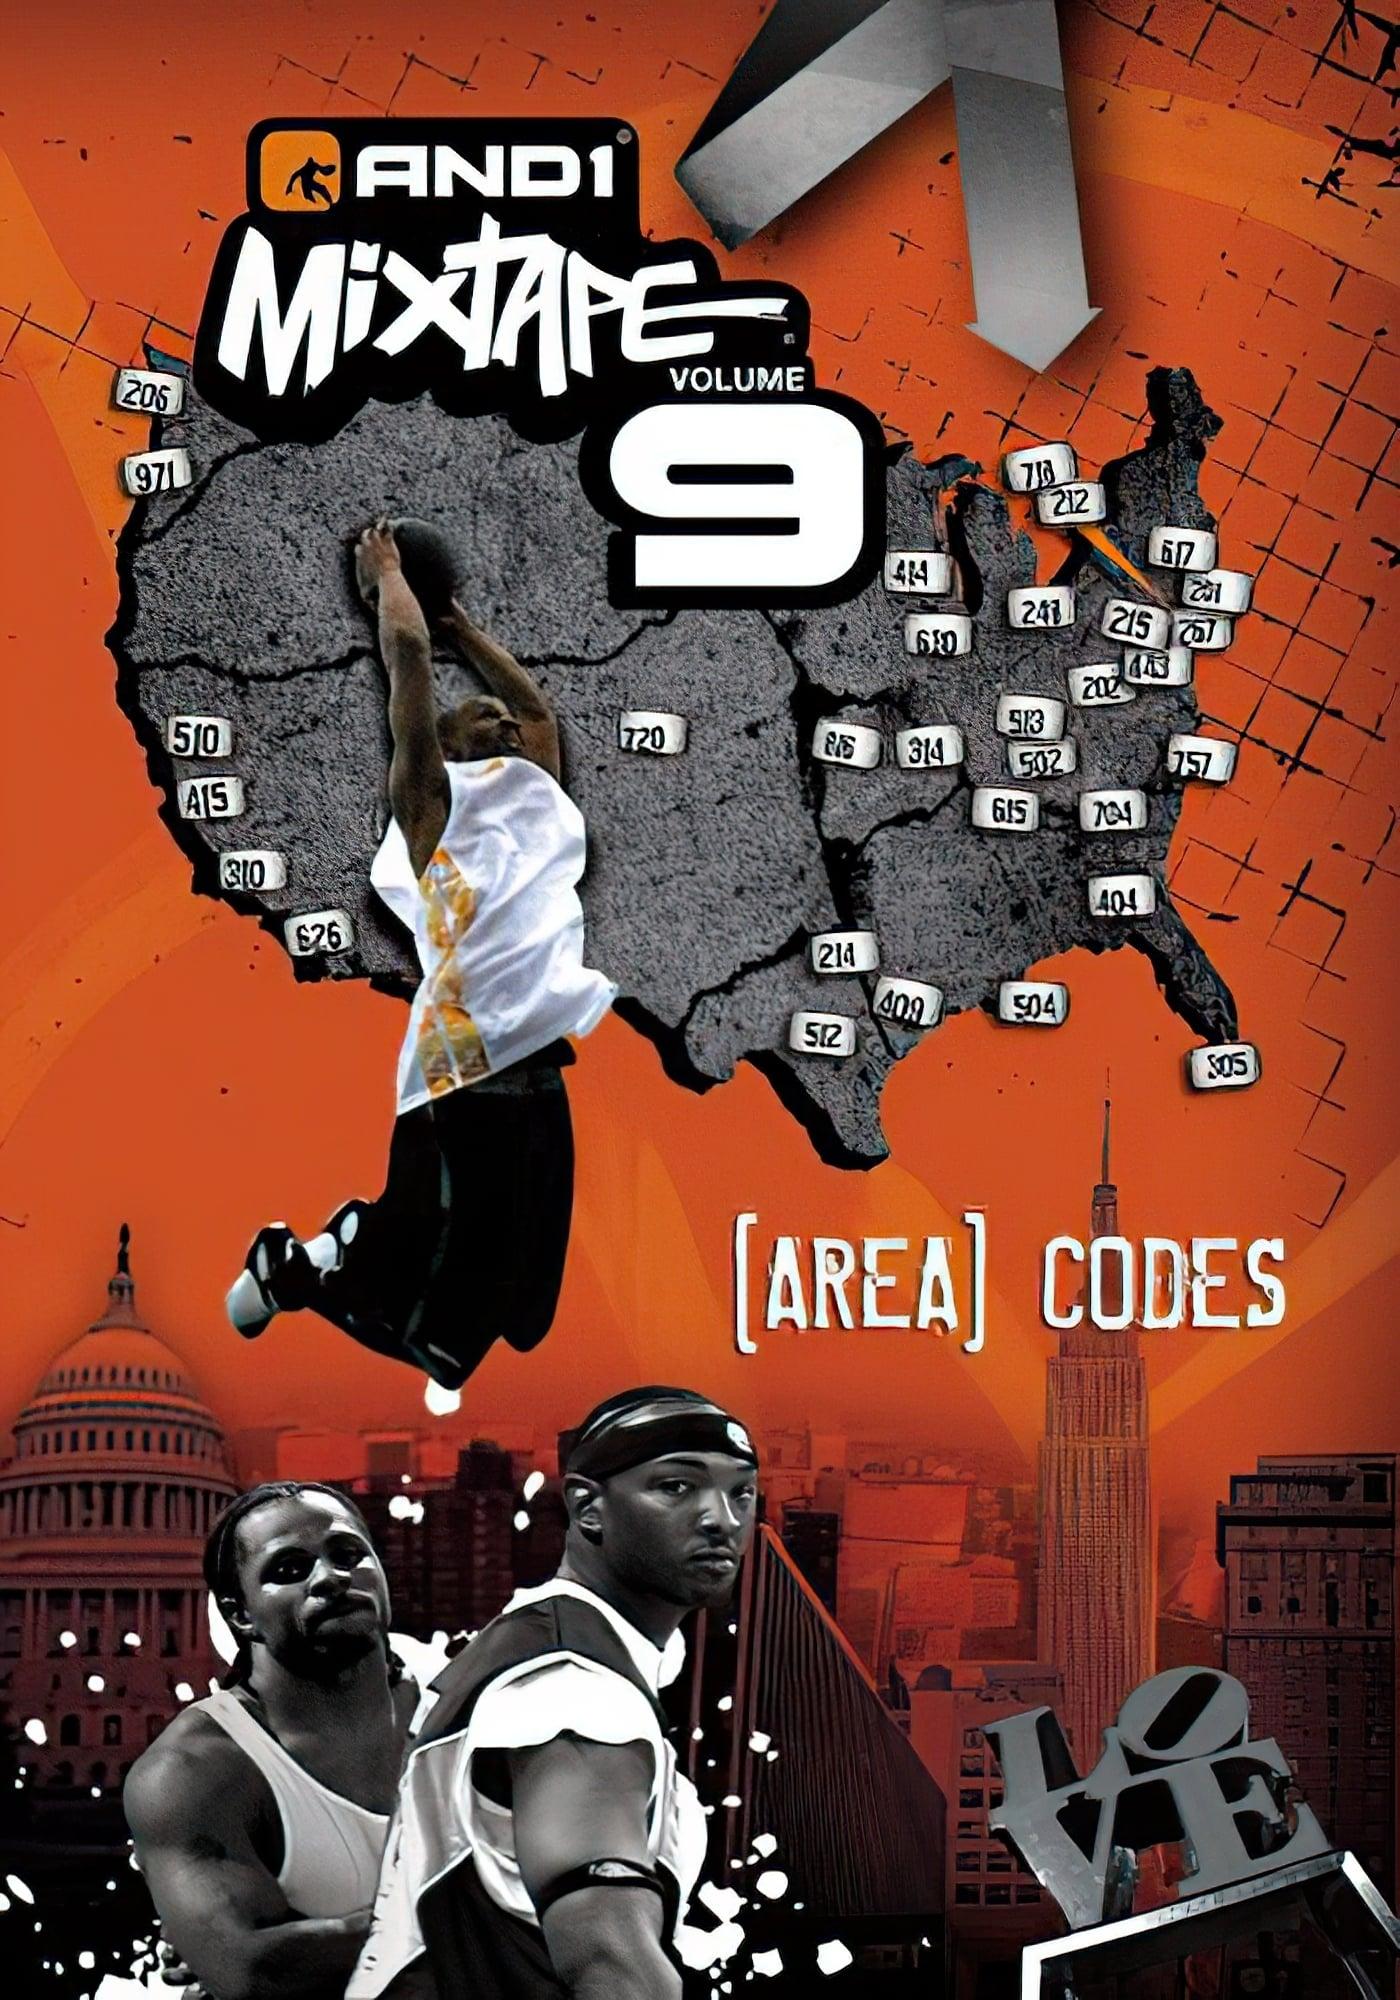 AND1 Mixtape Vol. 9: Area Codes